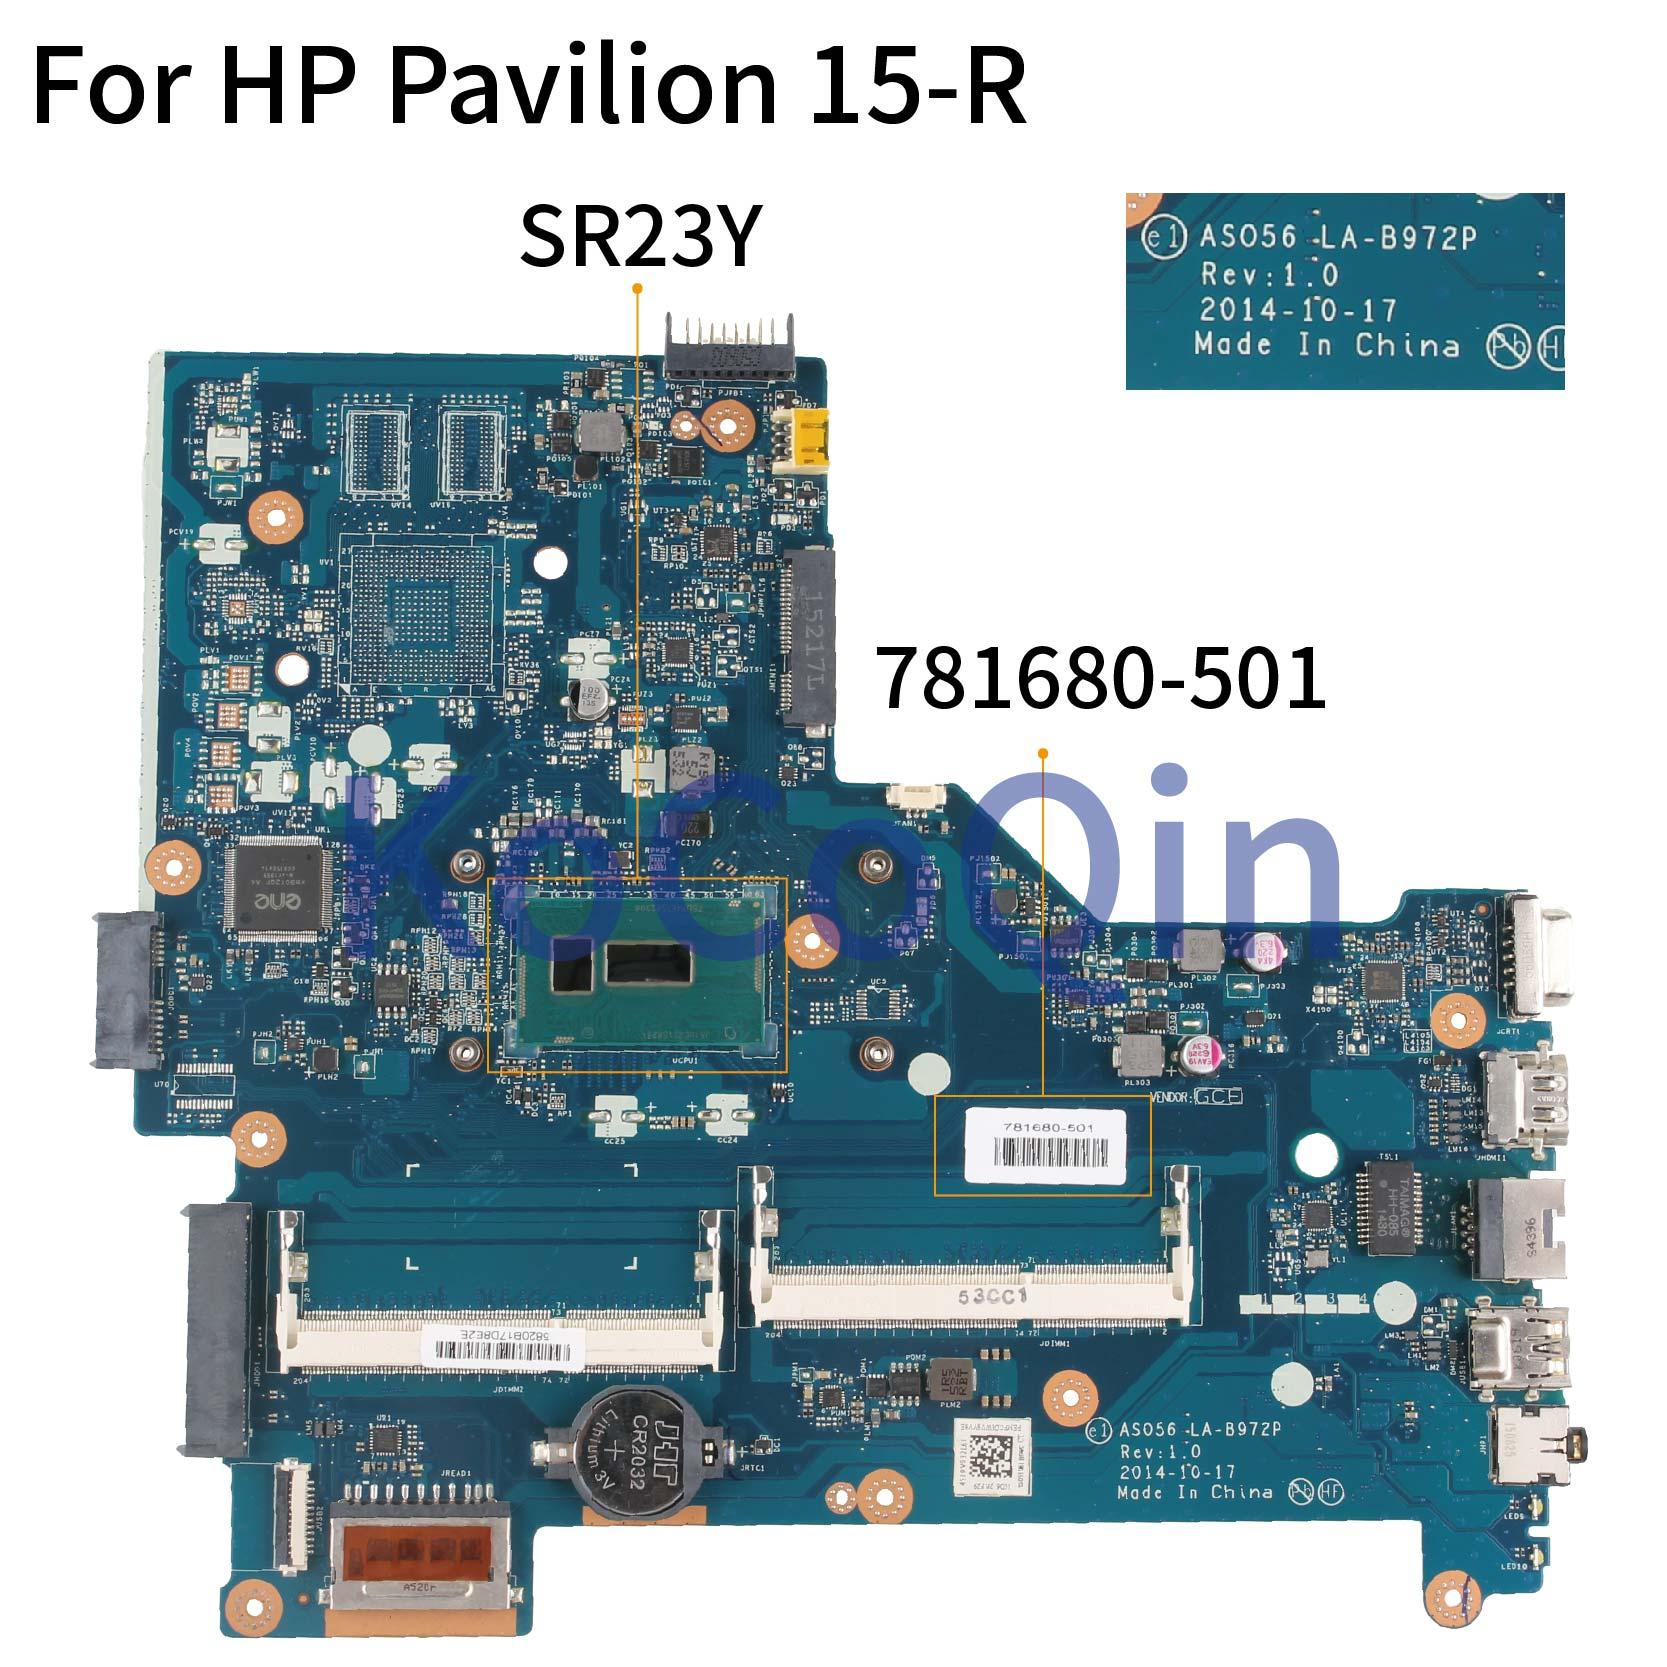 KoCoQin placa base para portátil HP Pavilion 15-R 250 G3 I5-5200U placa base 781680-001 781680-501 ASO56 LA-B972P SR23Y